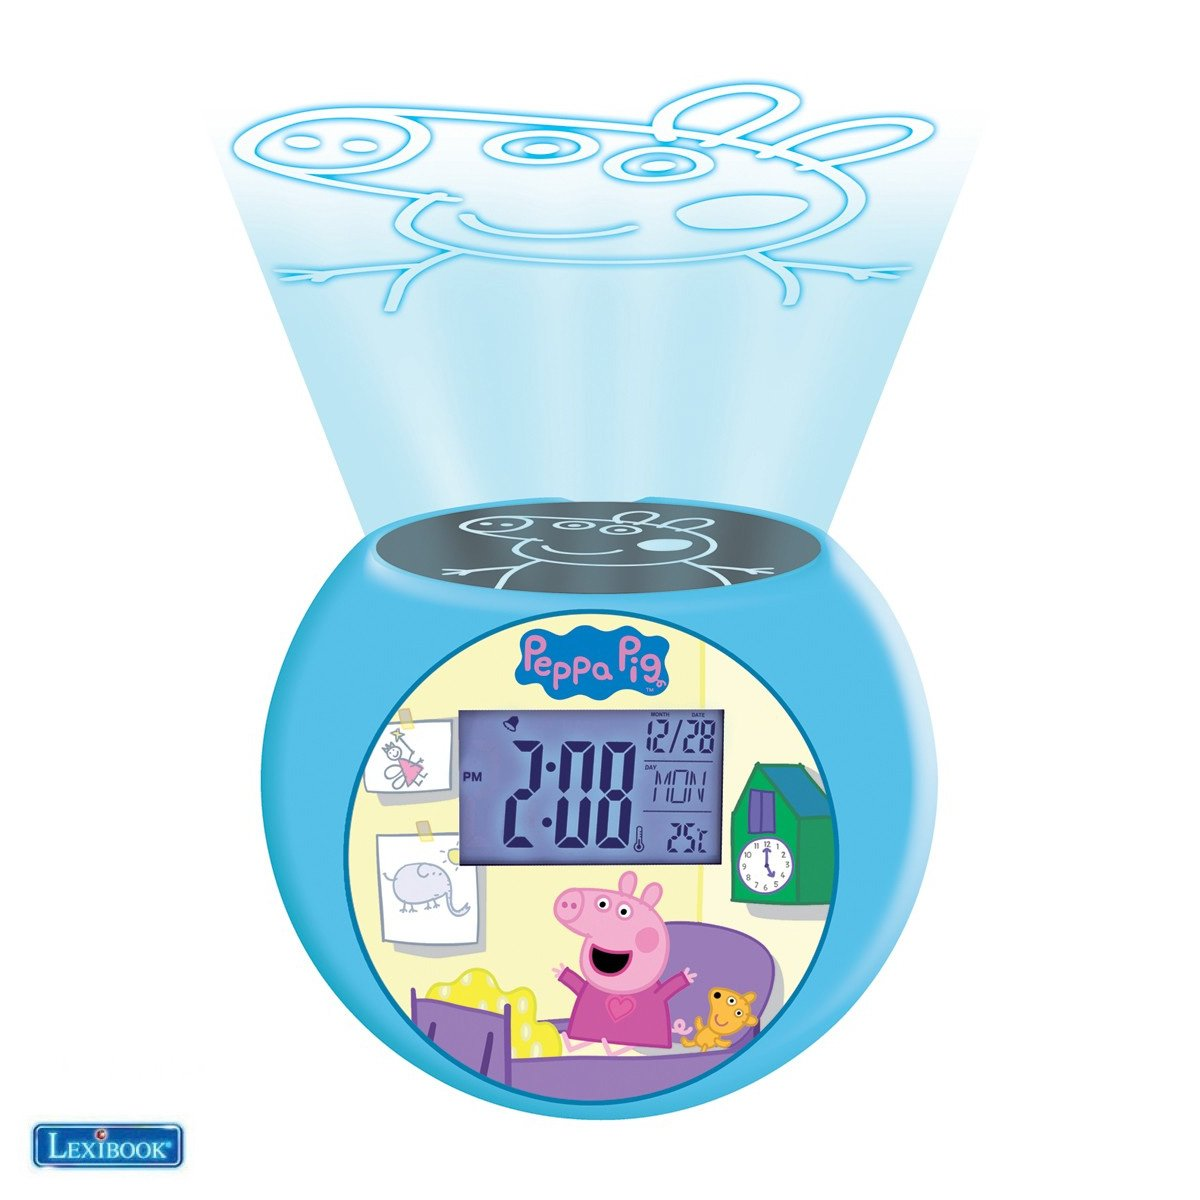 Lexibook - Peppa Pig Projector Radio Alarm Clock (RL975PP)